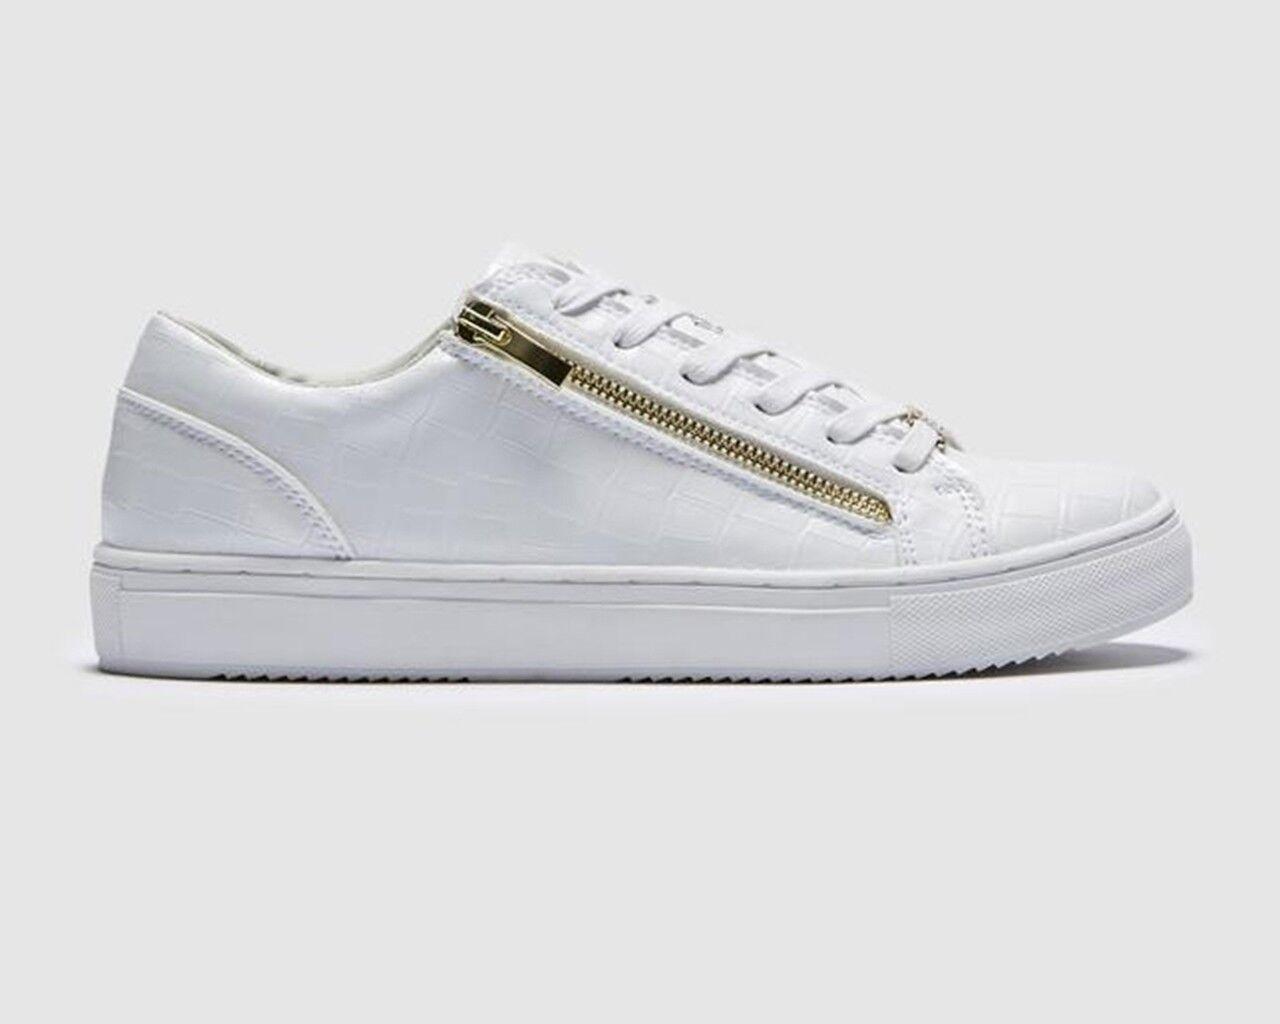 Certified LONDON Hombre l7fw0022 Amo cupsole Zapatillas Hombre LONDON zapatos blancos 0c2c94